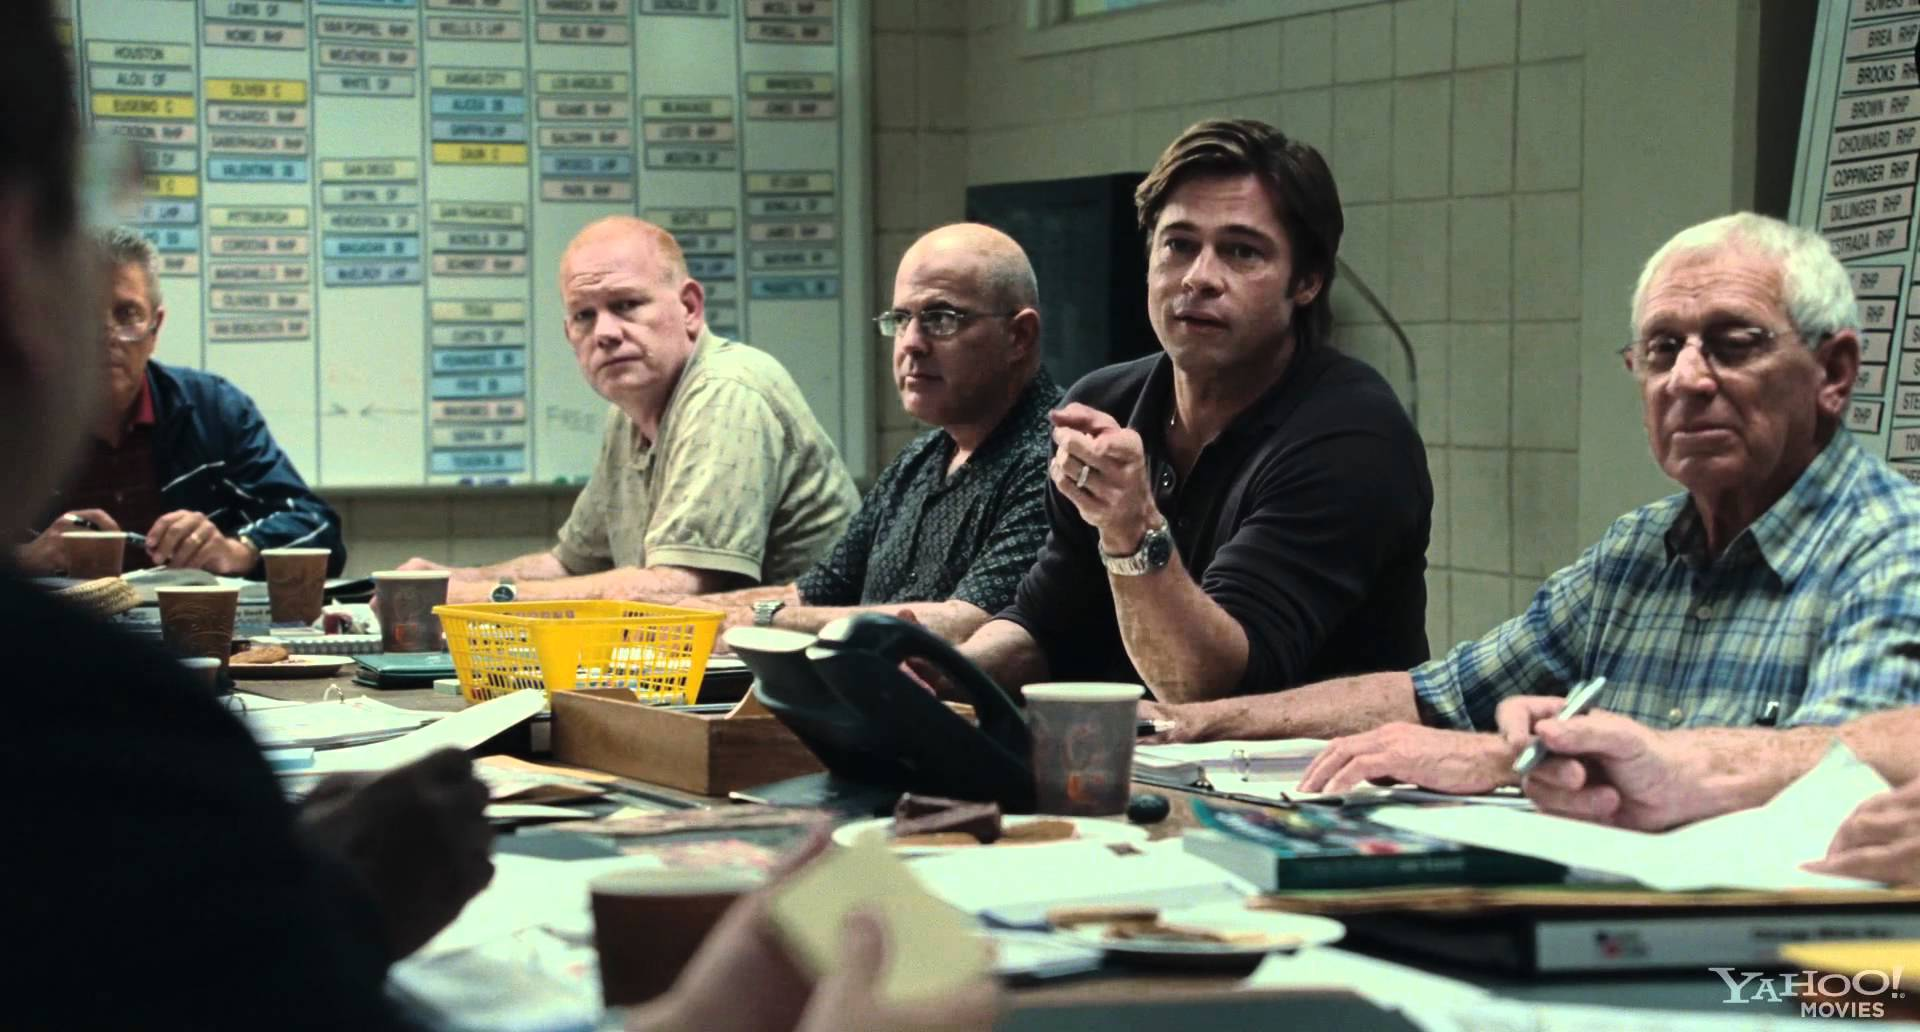 Brad Pitt's TAG Heuer in Moneyball